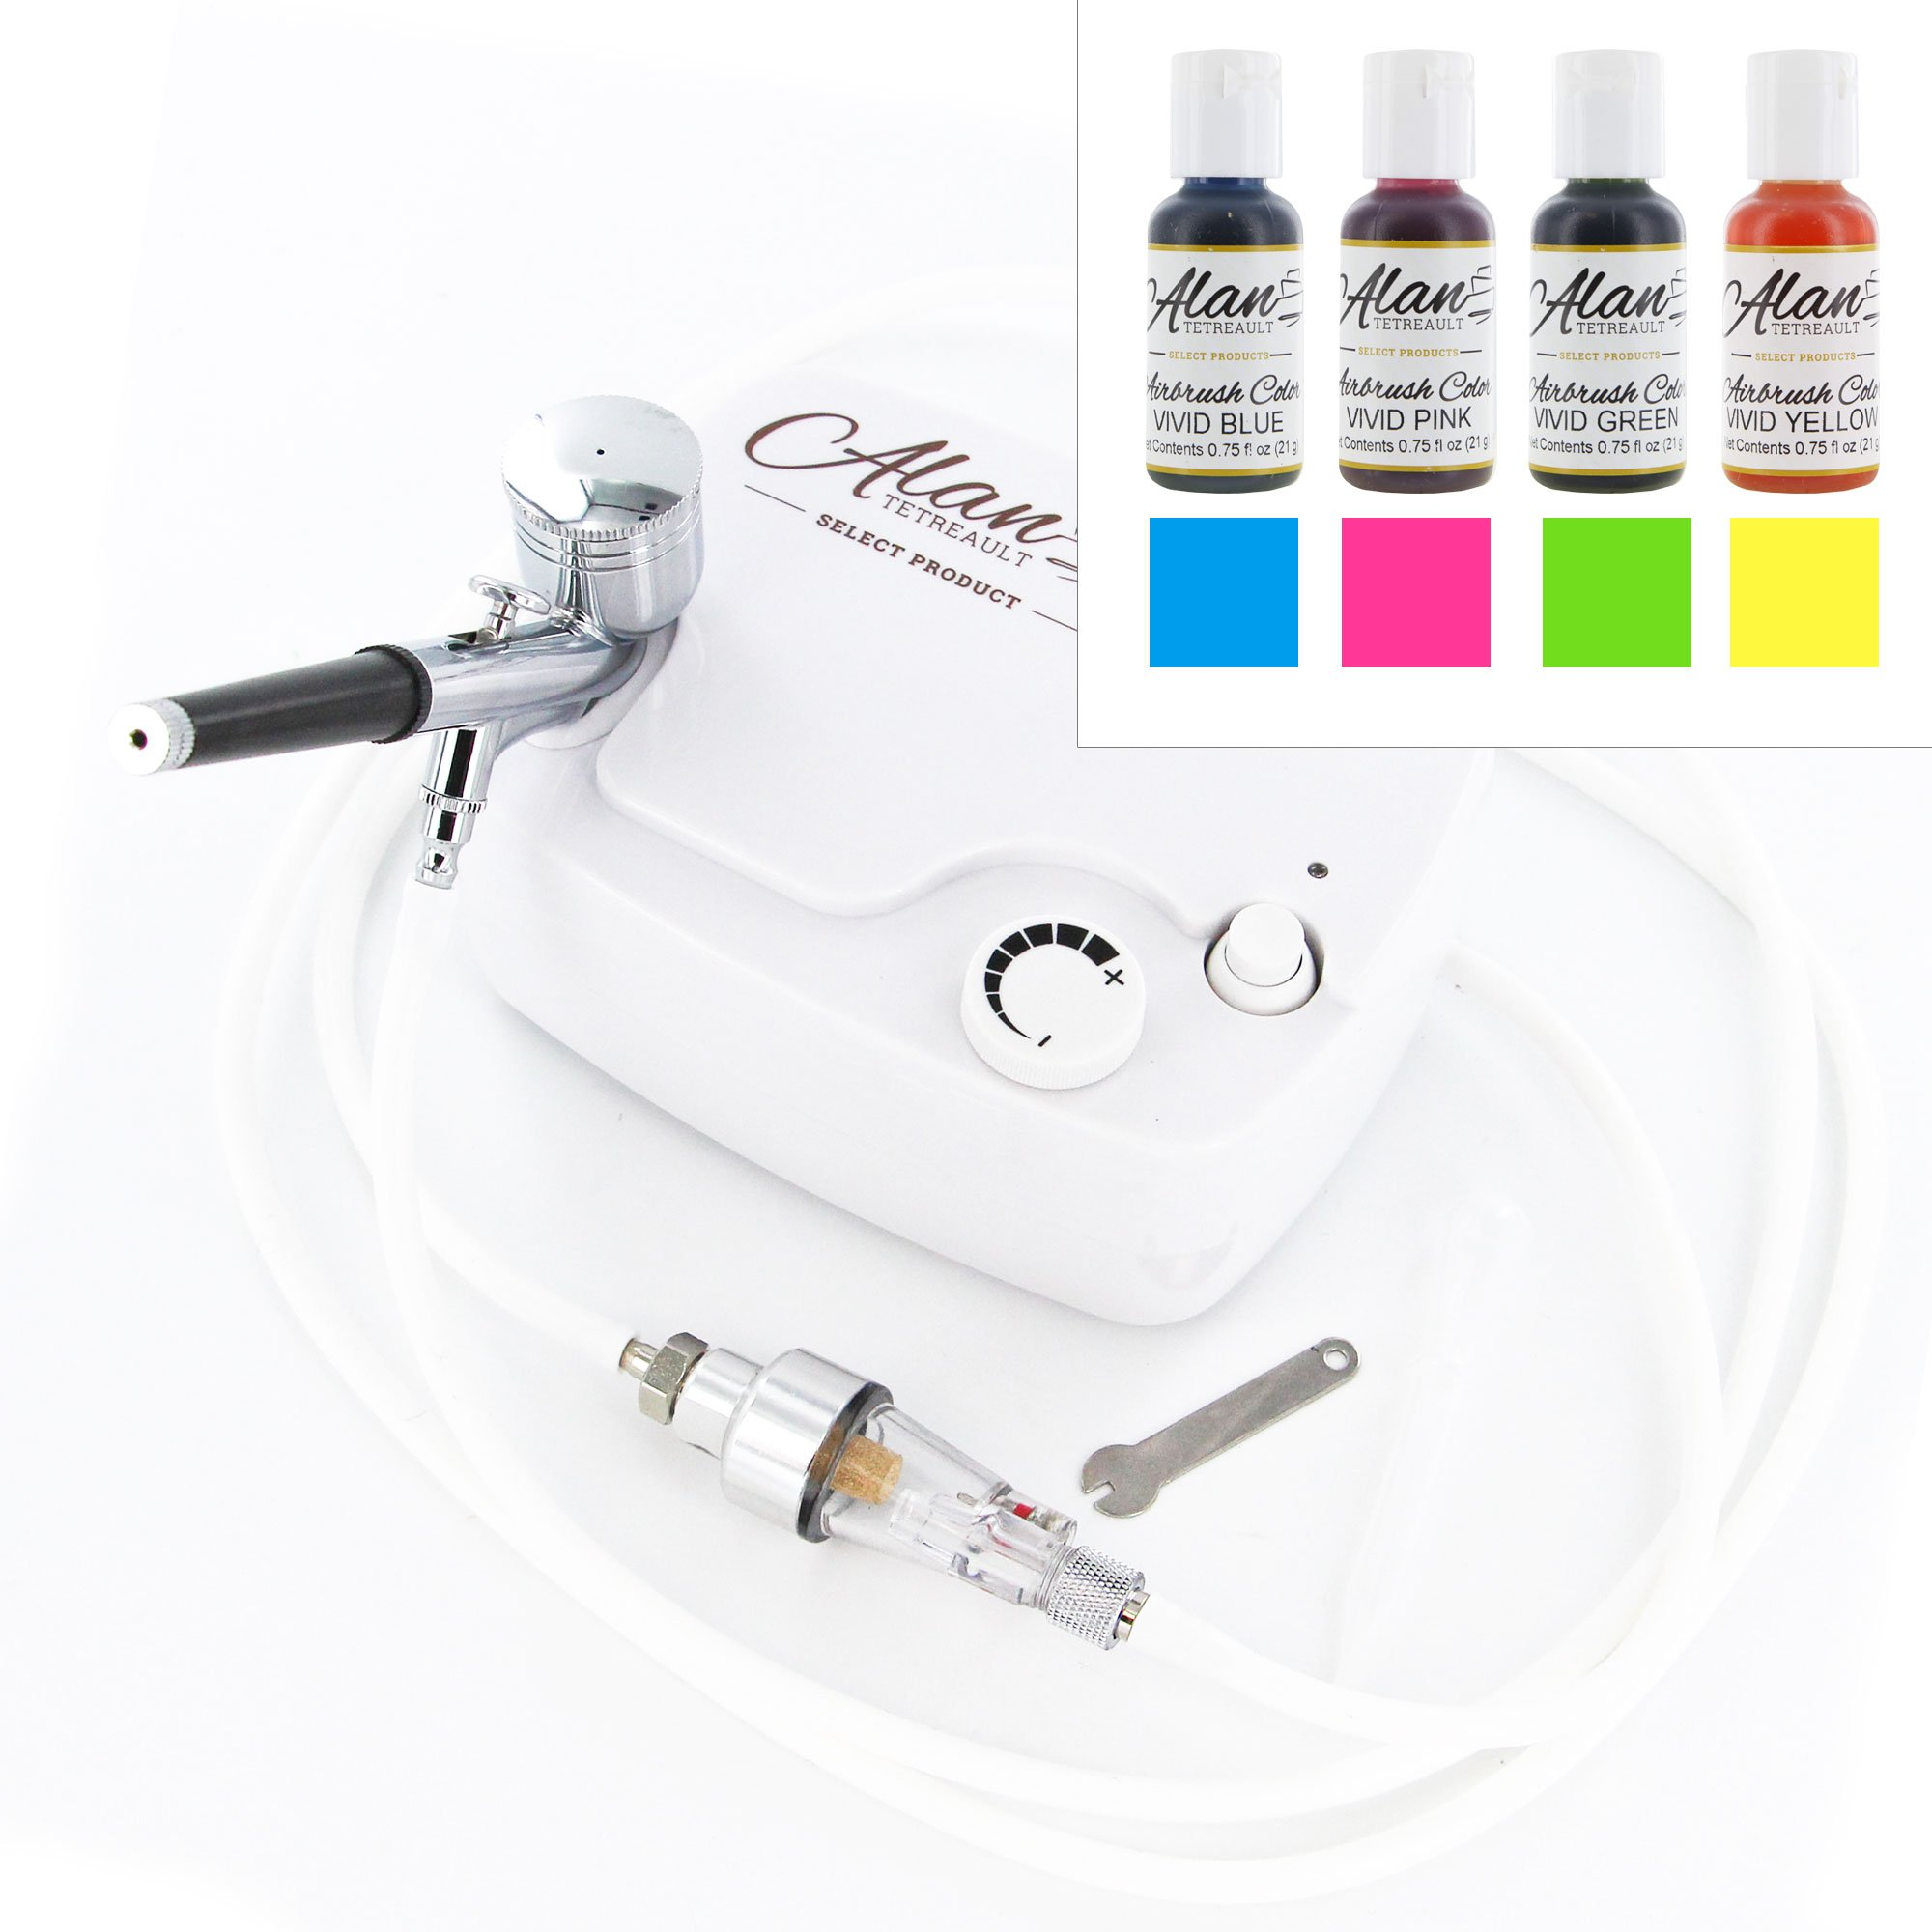 Airbrush & Compressor Kit